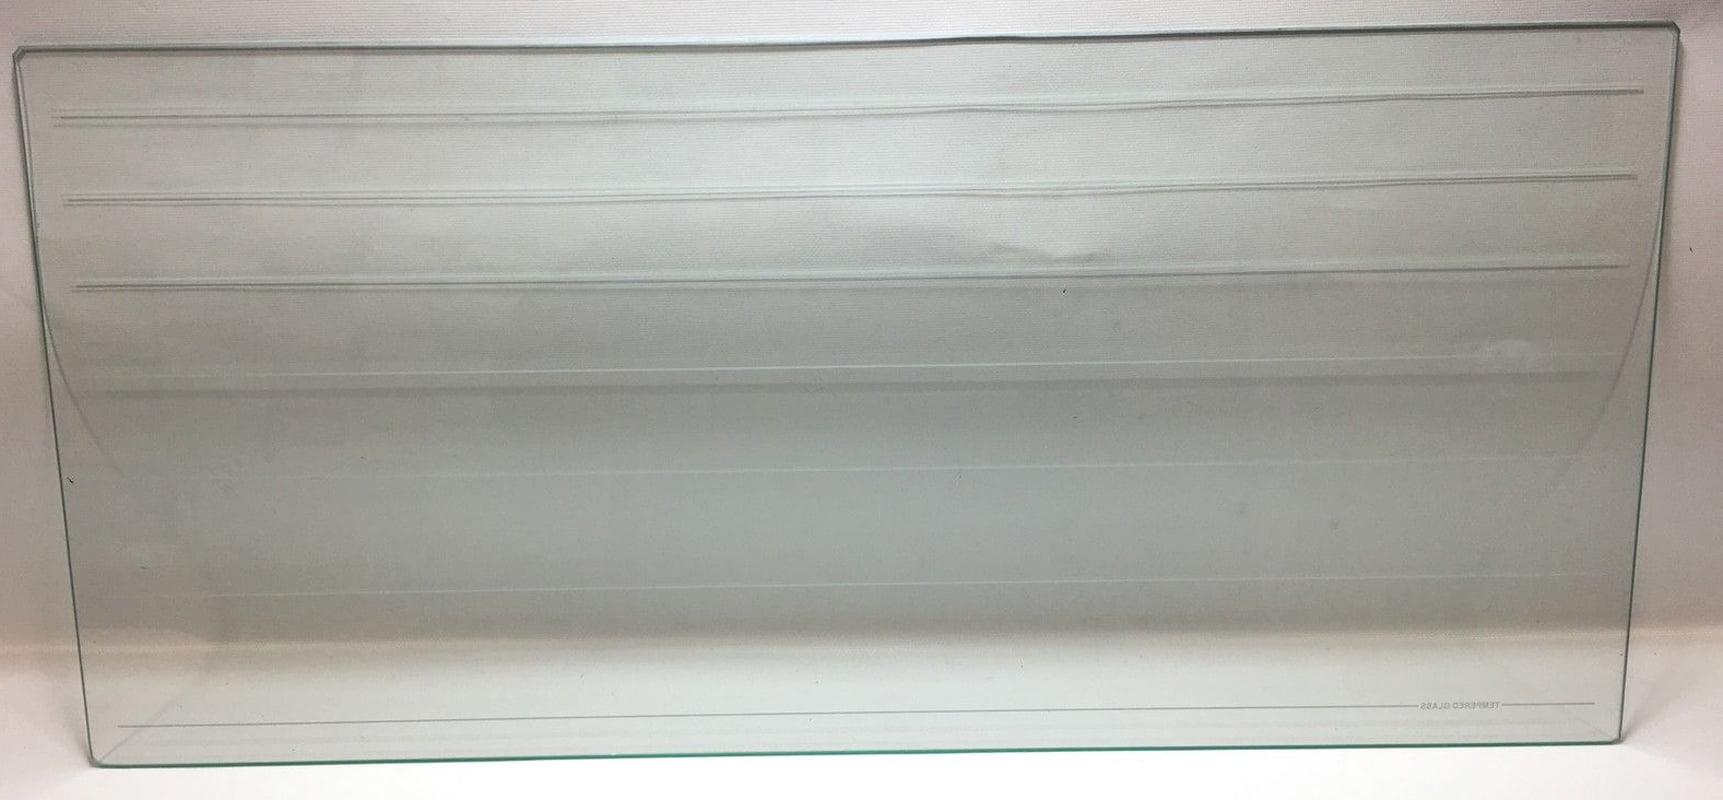 2210047 Whirlpool Refrigerator Glass-Shelf Crisper Cov OEM 2210047 by